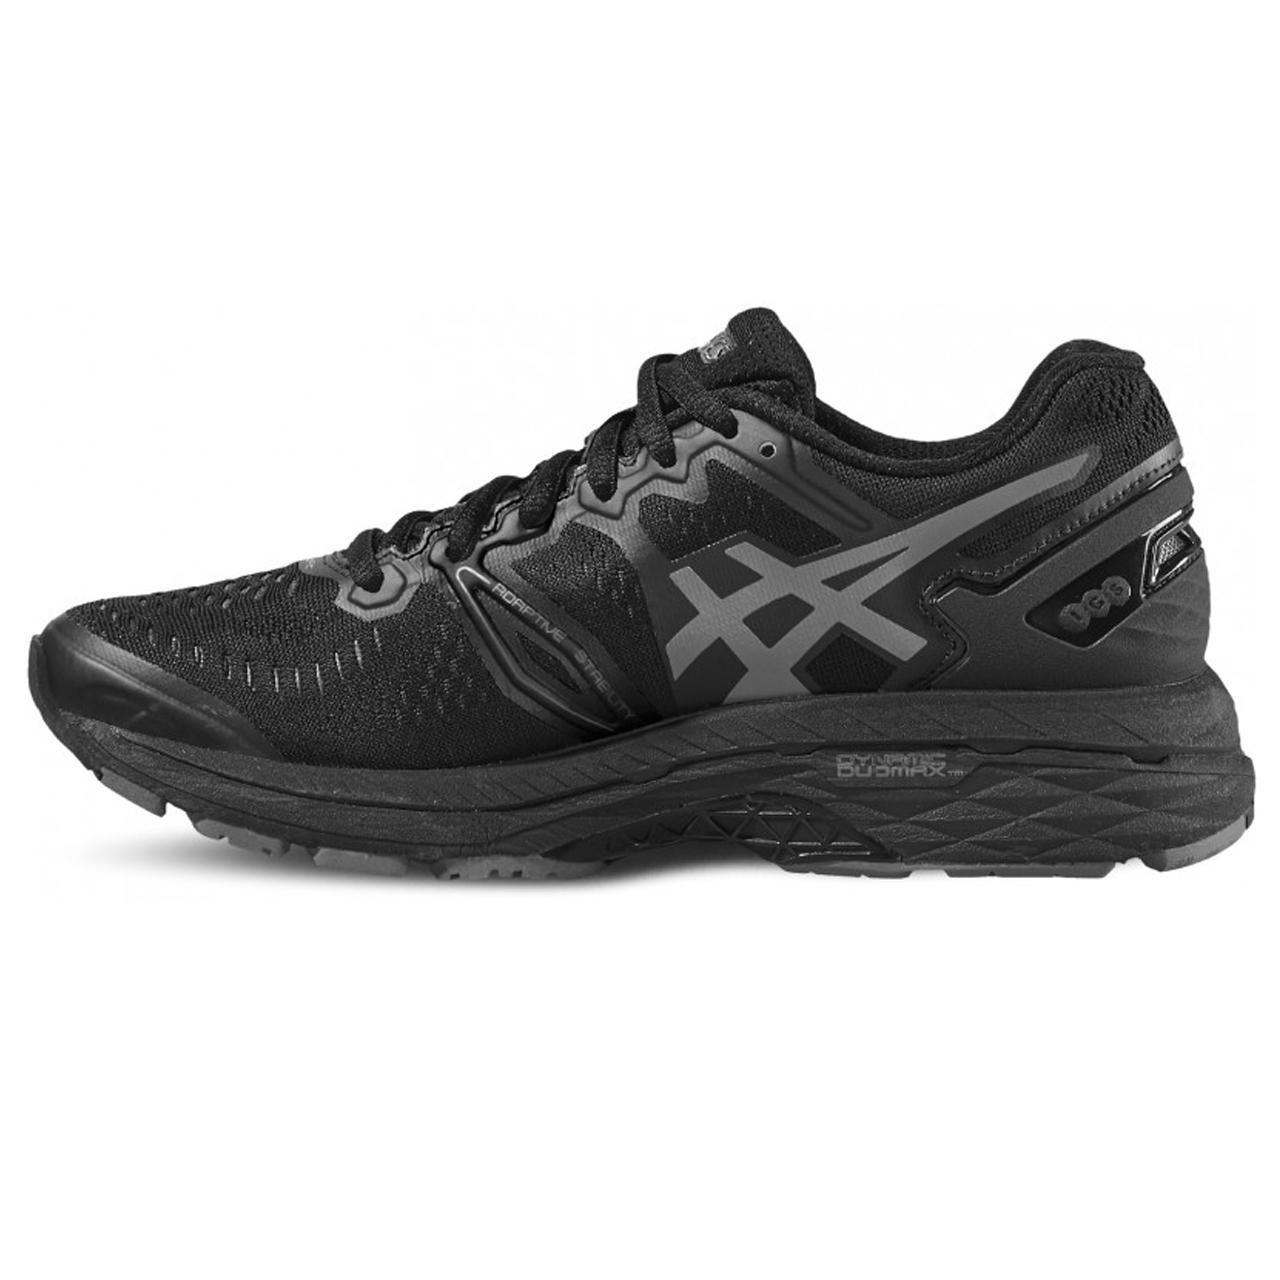 کفش مخصوص دویدن زنانه اسیکس مدل kayano کد 986-053